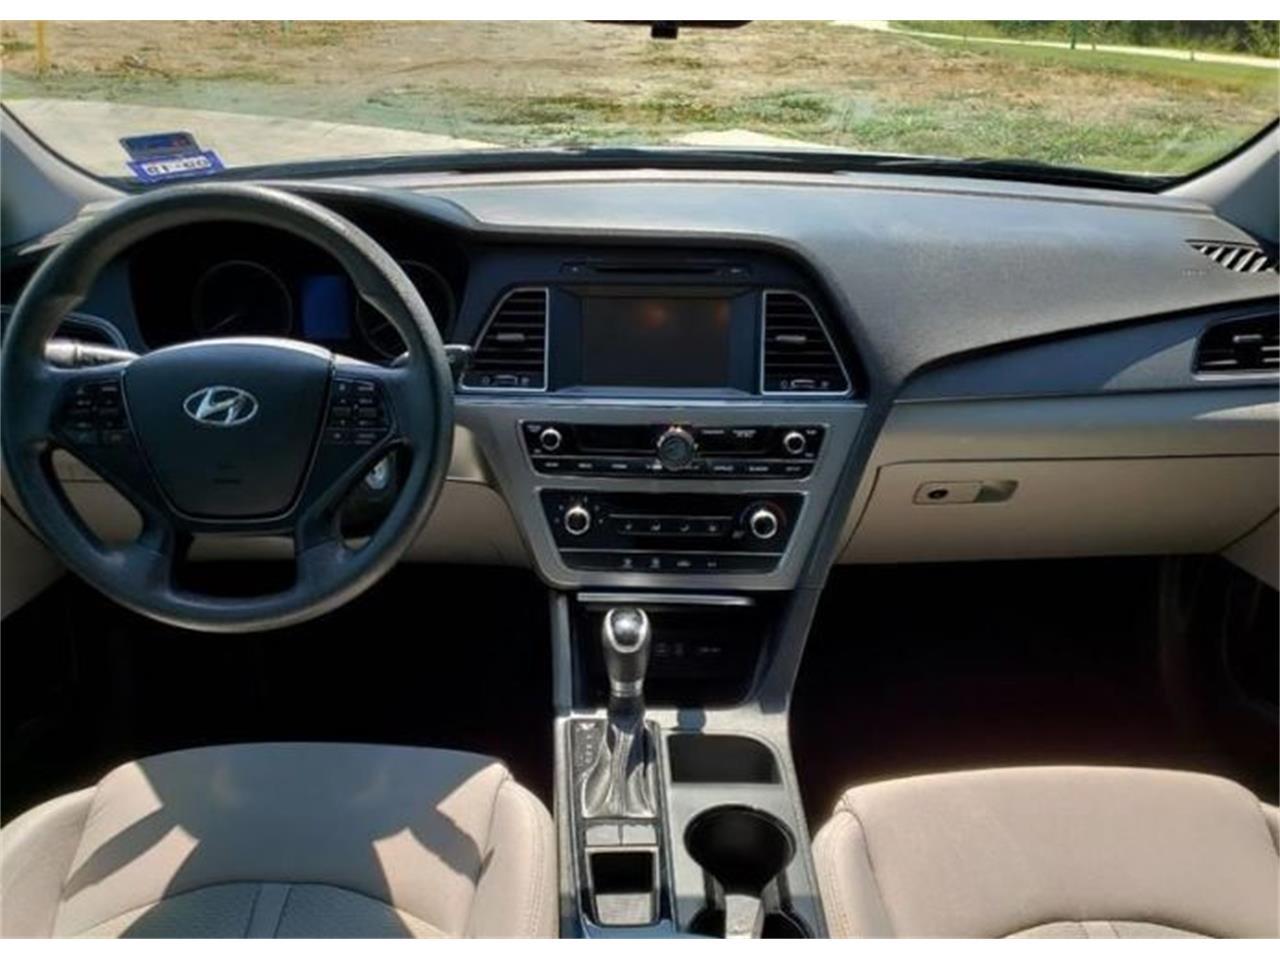 2016 Hyundai Sonata (CC-1302705) for sale in Cadillac, Michigan